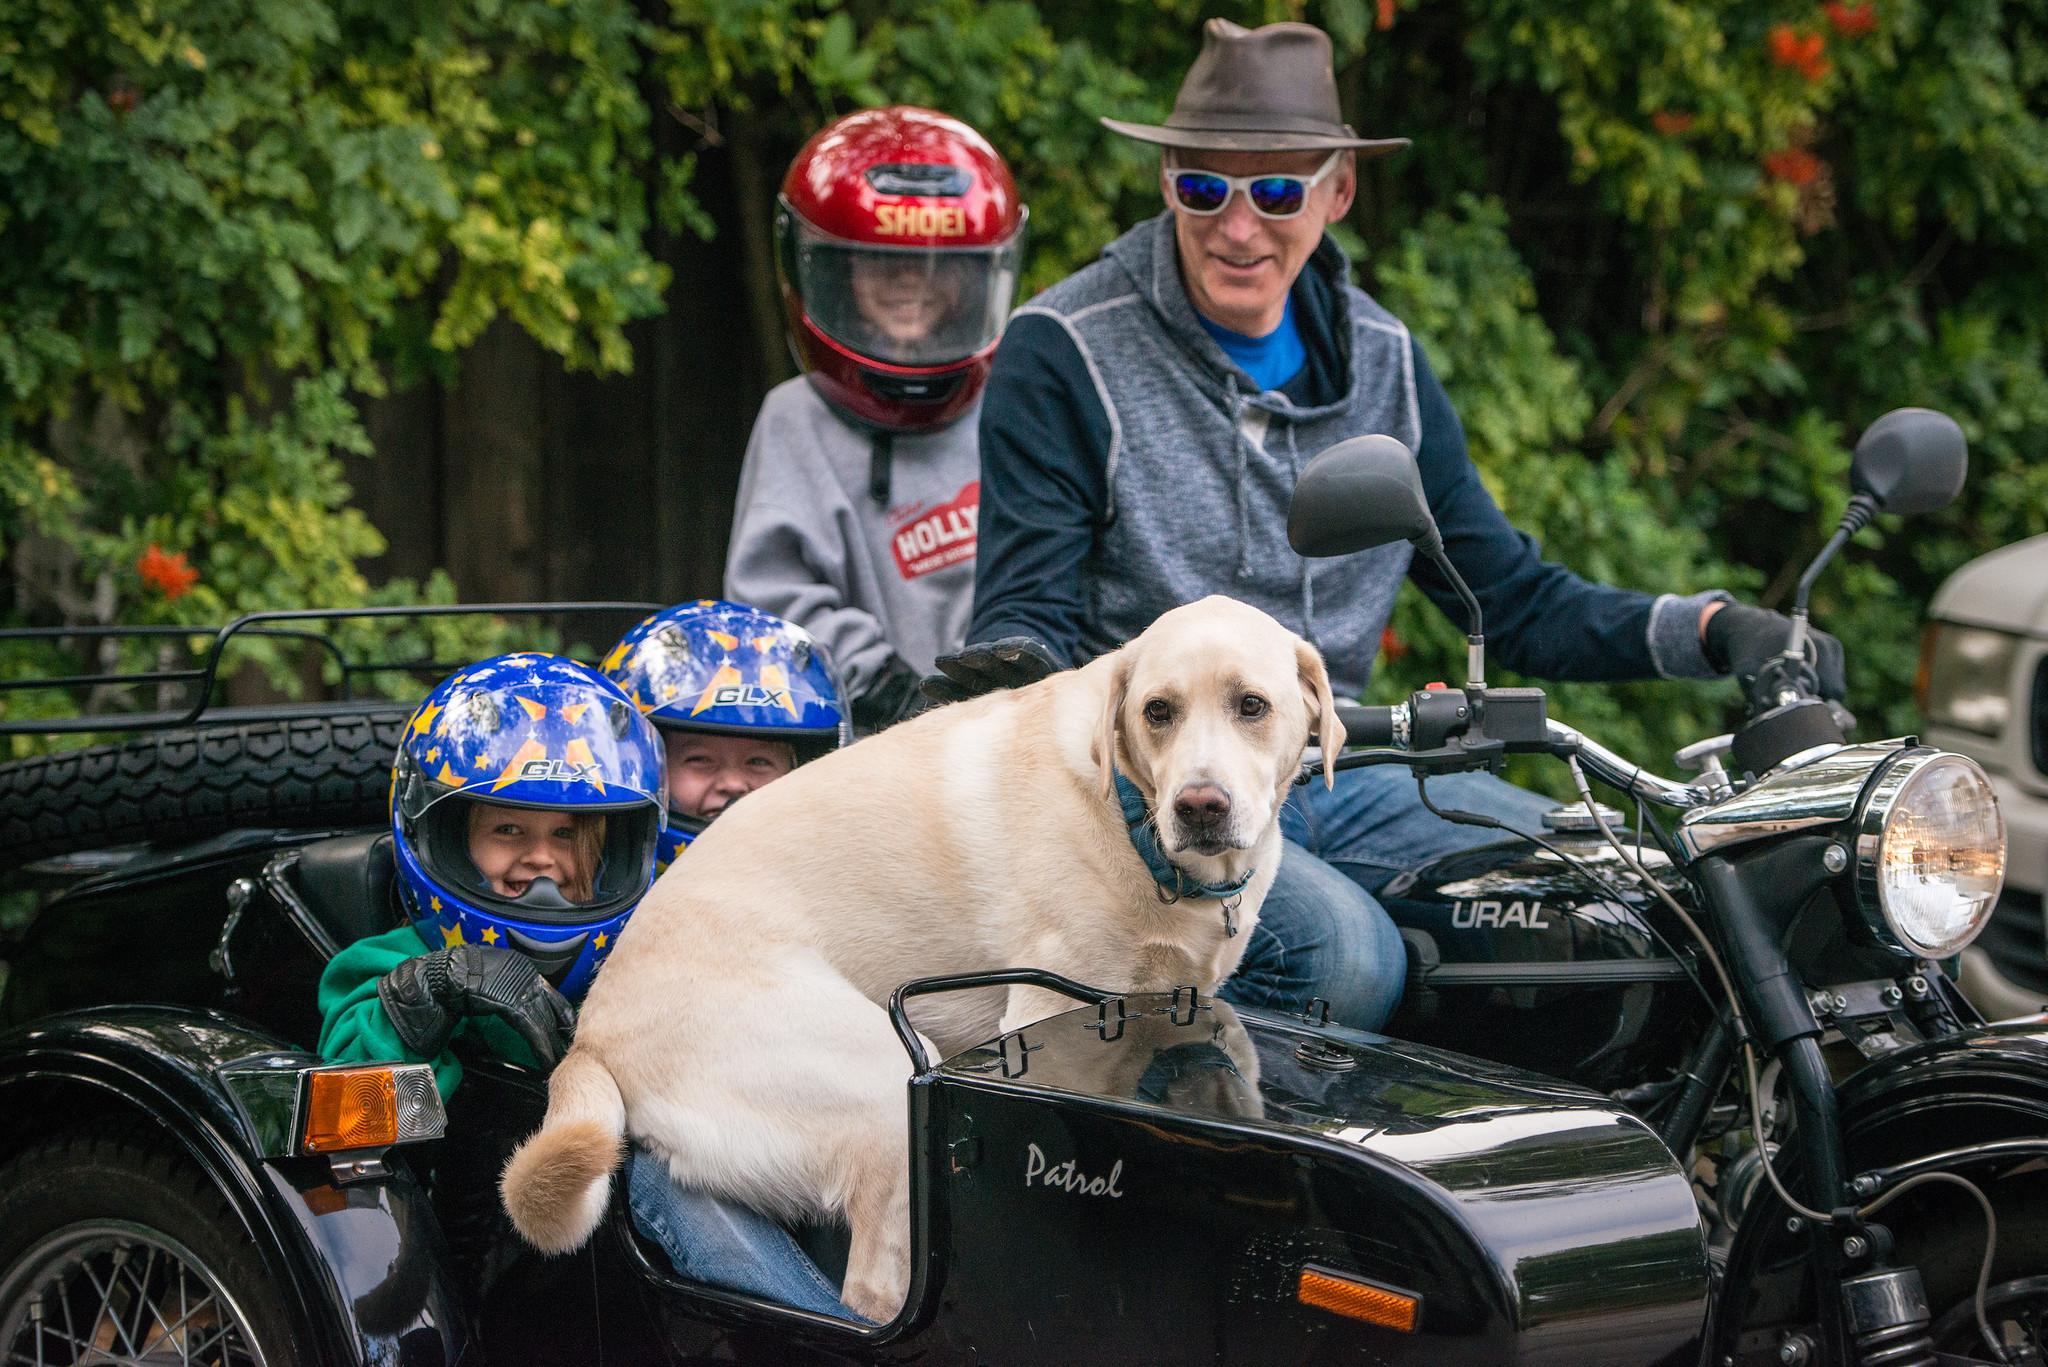 Chris-MacAskill-Baldy-ADV-Forum-Adventure-Rider-Radio-Motorcycle-Podcast-2.jpg